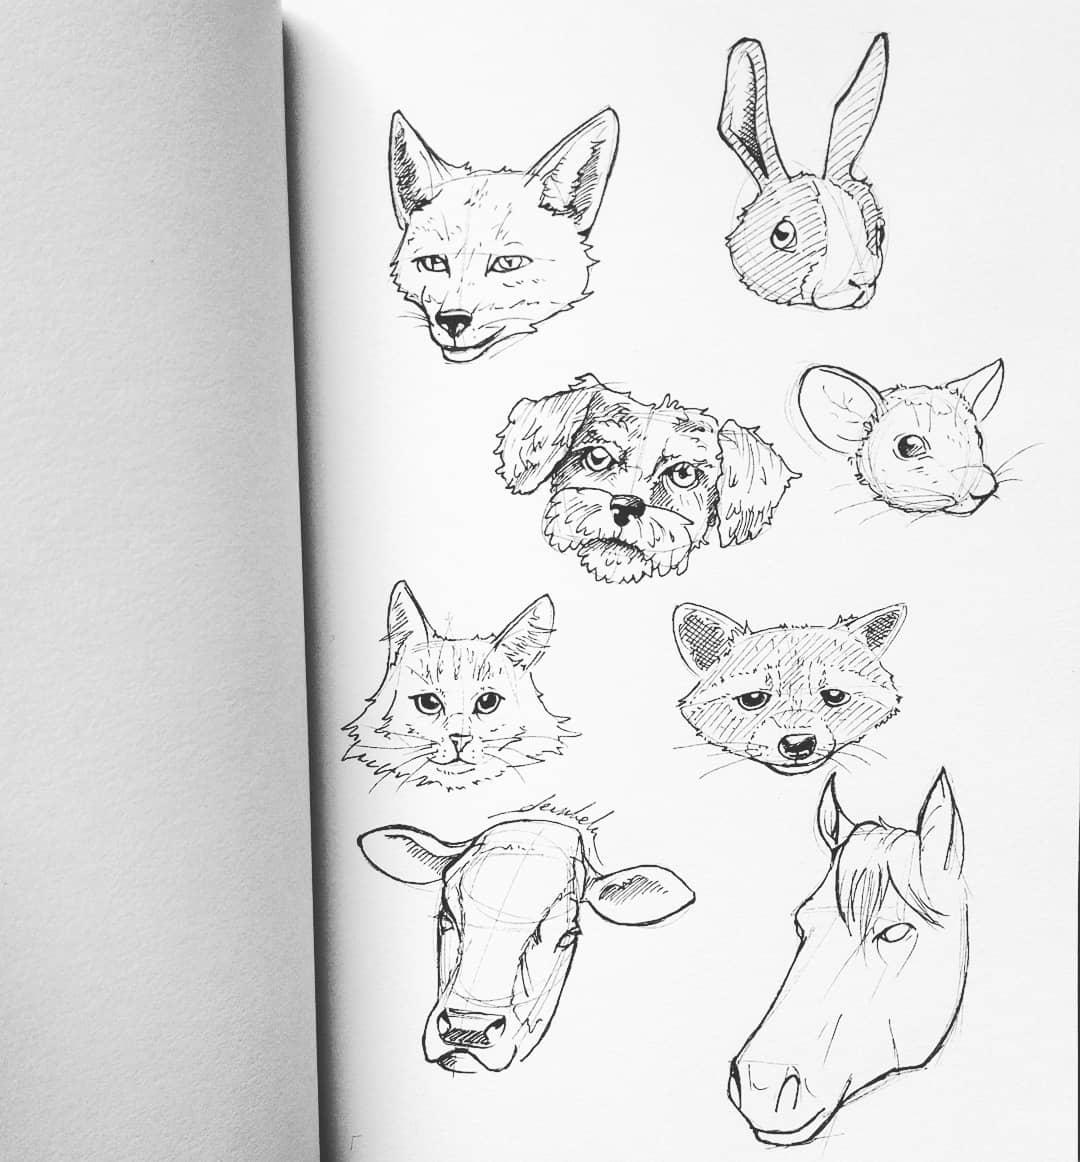 Animal heads #dailyart #dailyillustration #animalheads #animals #pets #dog #cat https://t.co/p75pznCqVG